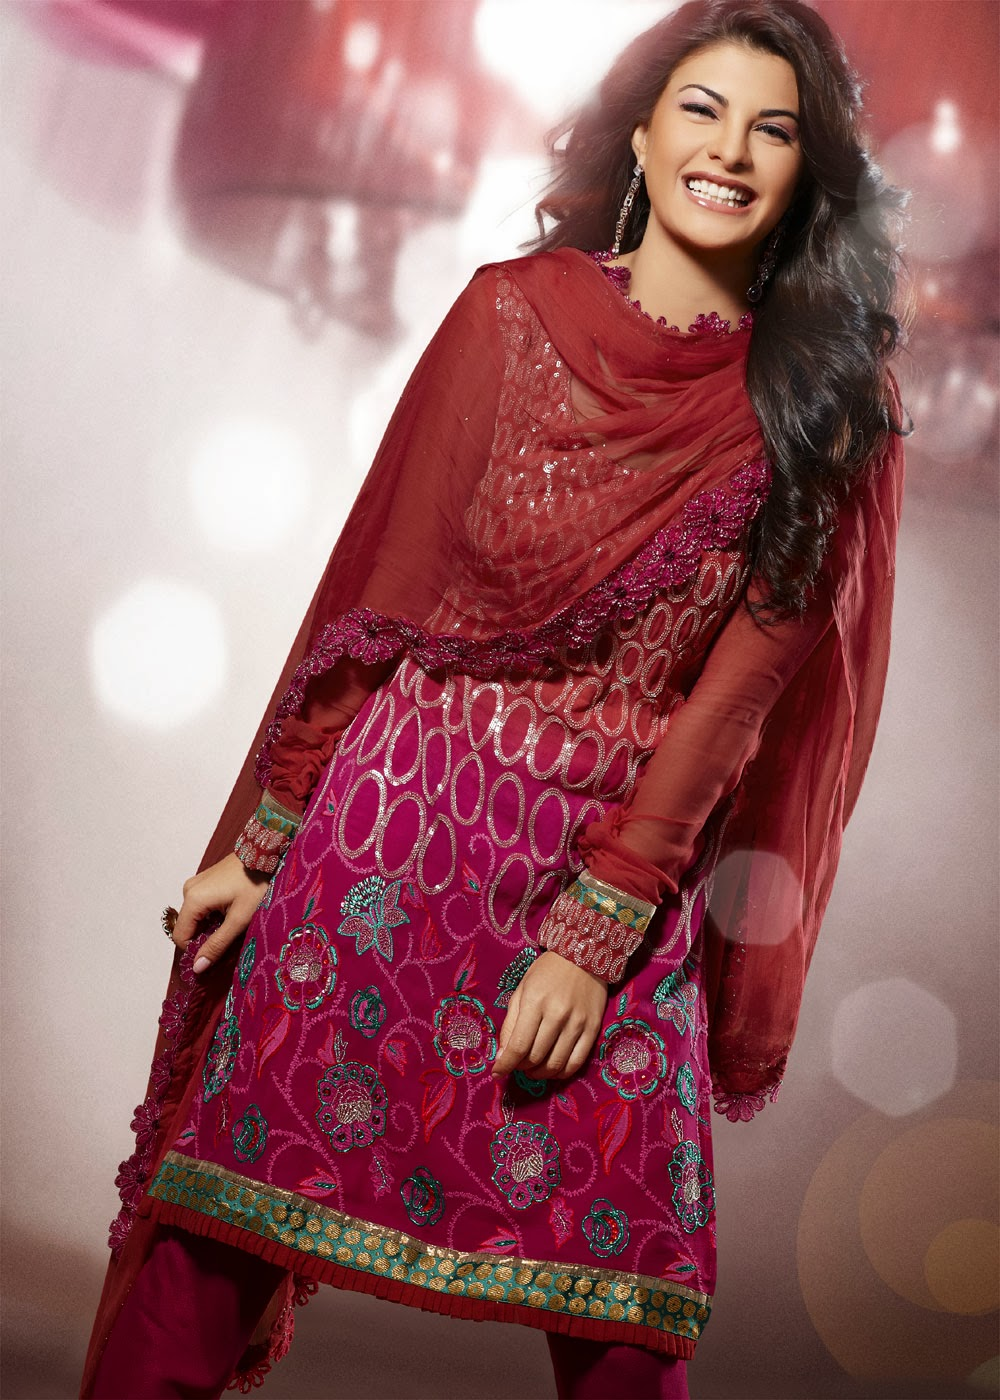 Simple Pakistani Girl Wallpaper Bollywood Upcoming Star Jacqueline Fernandez Salwar